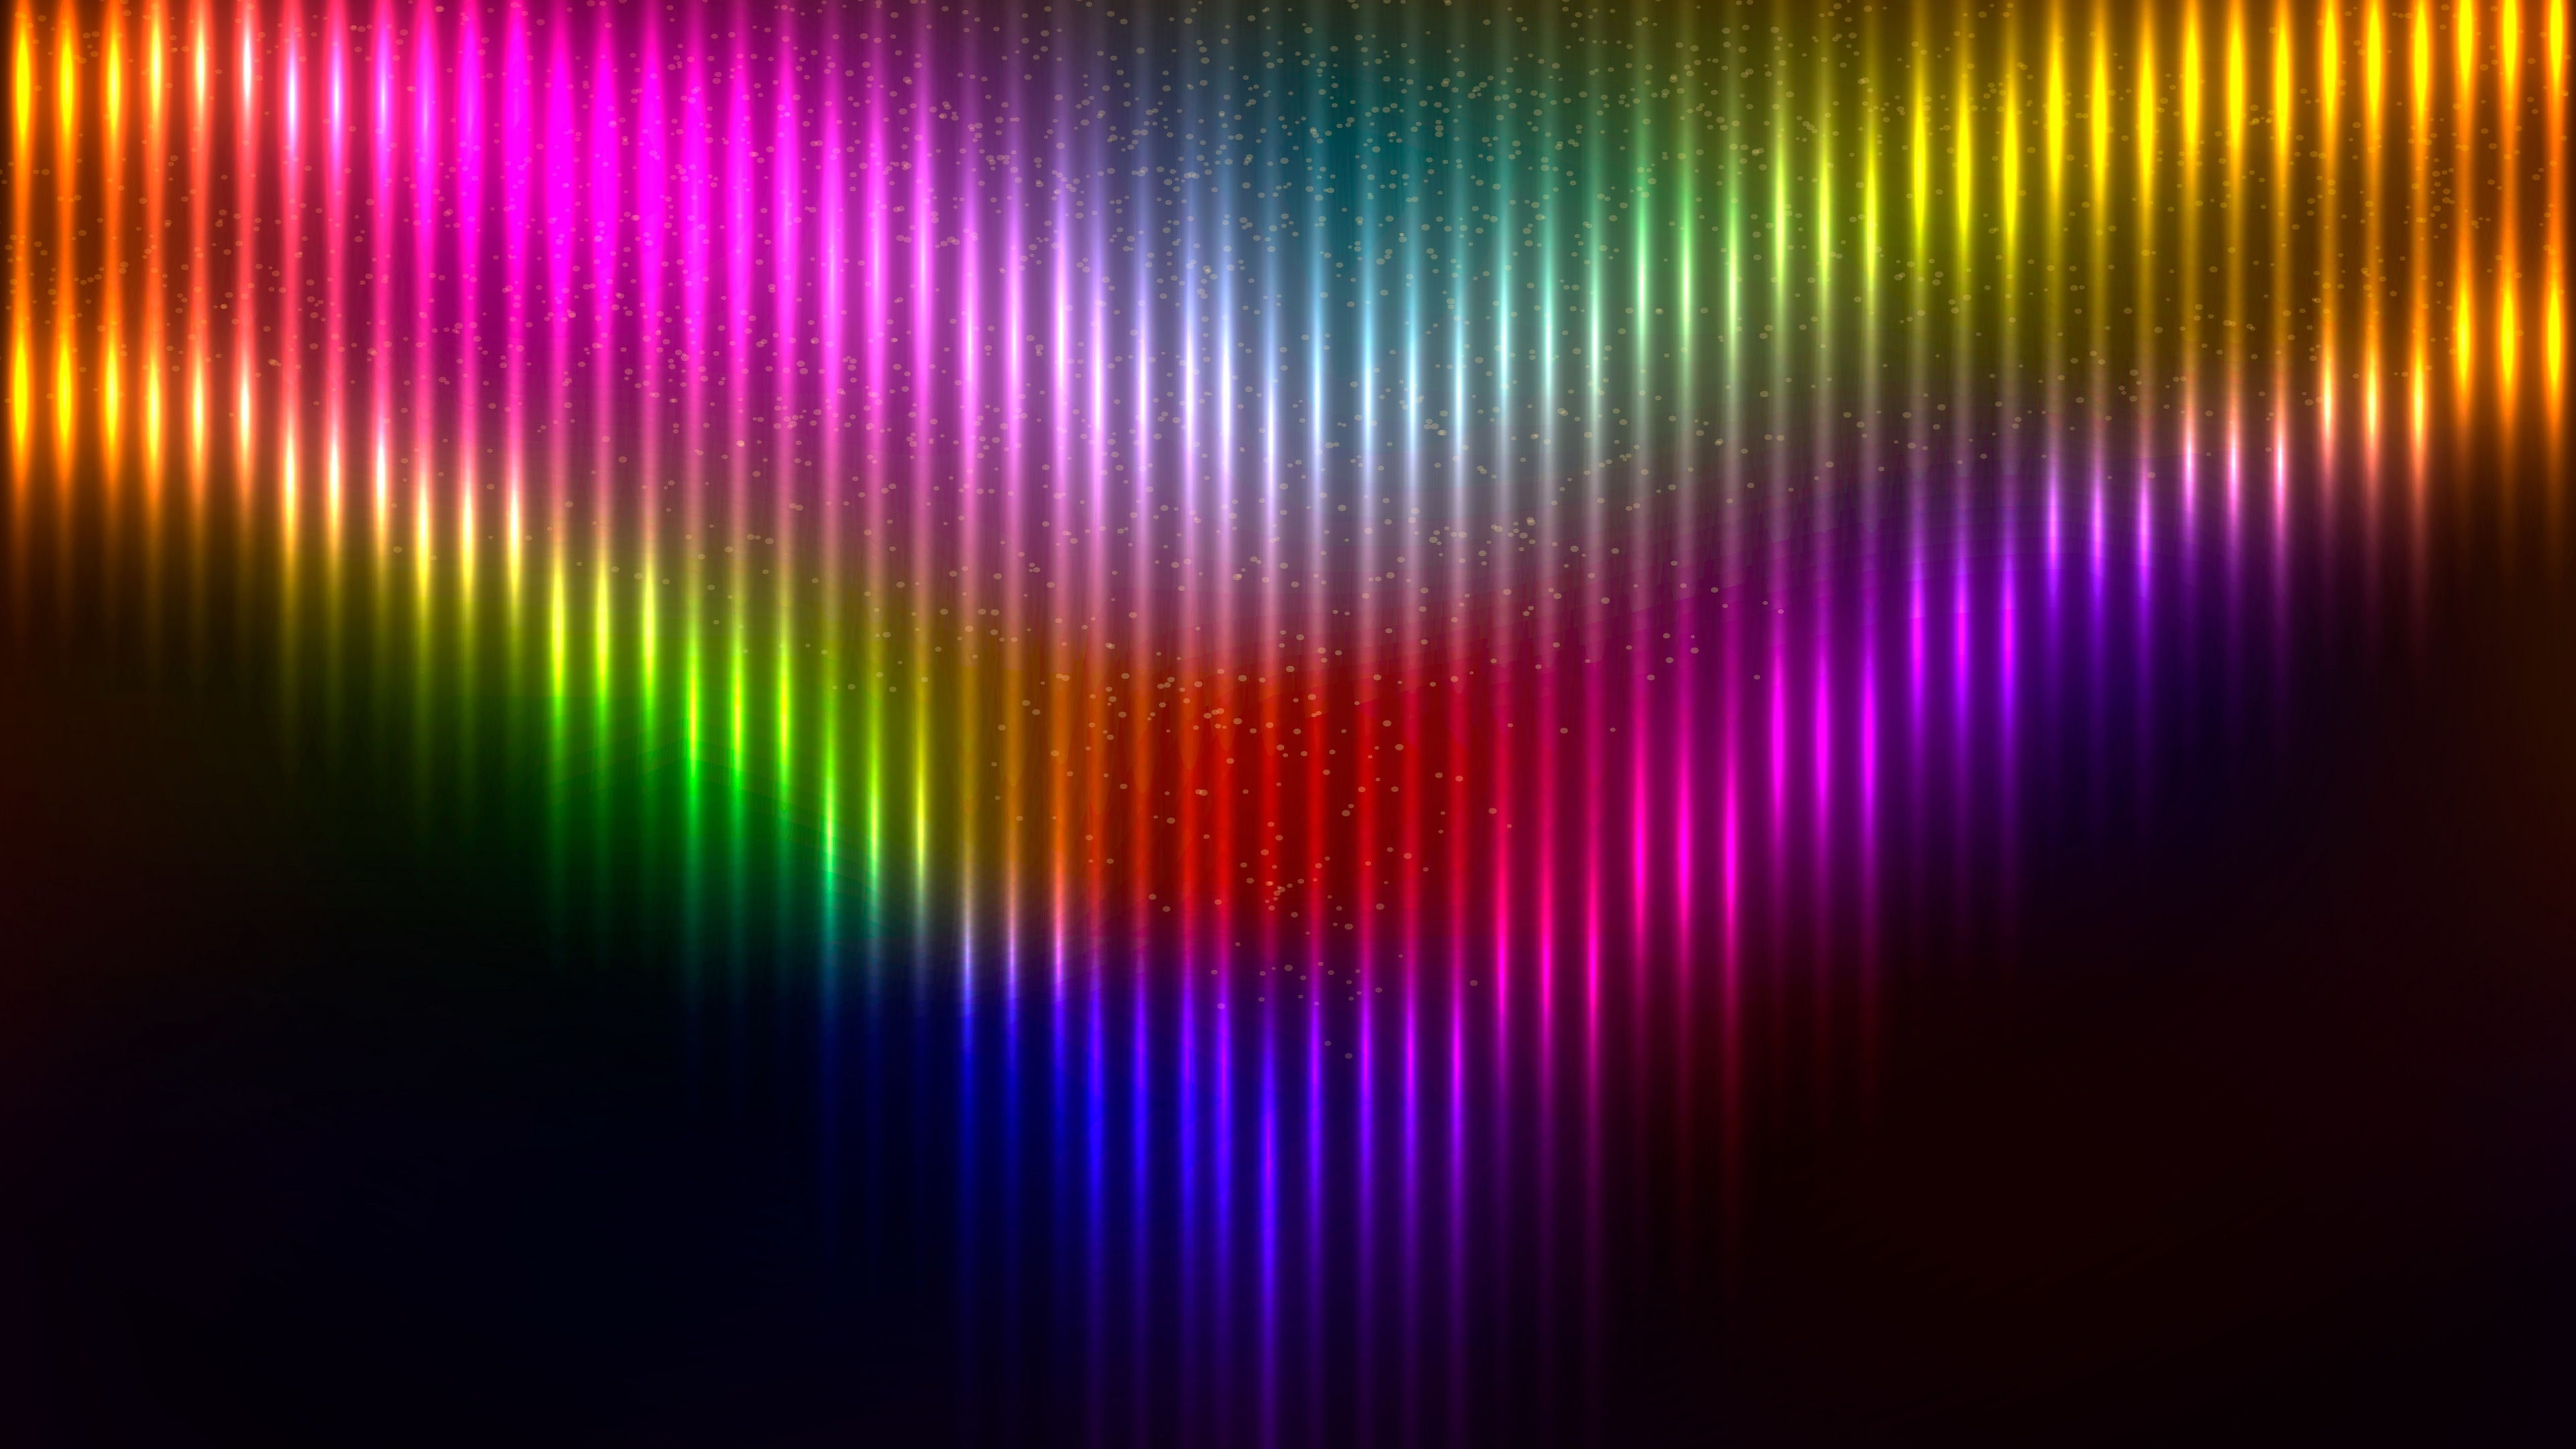 artistic colors rainbow background 4k 1539371141 - Artistic Colors Rainbow Background 4k - rainbow wallpapers, hd-wallpapers, colors wallpapers, background wallpapers, artistic wallpapers, abstract wallpapers, 4k-wallpapers